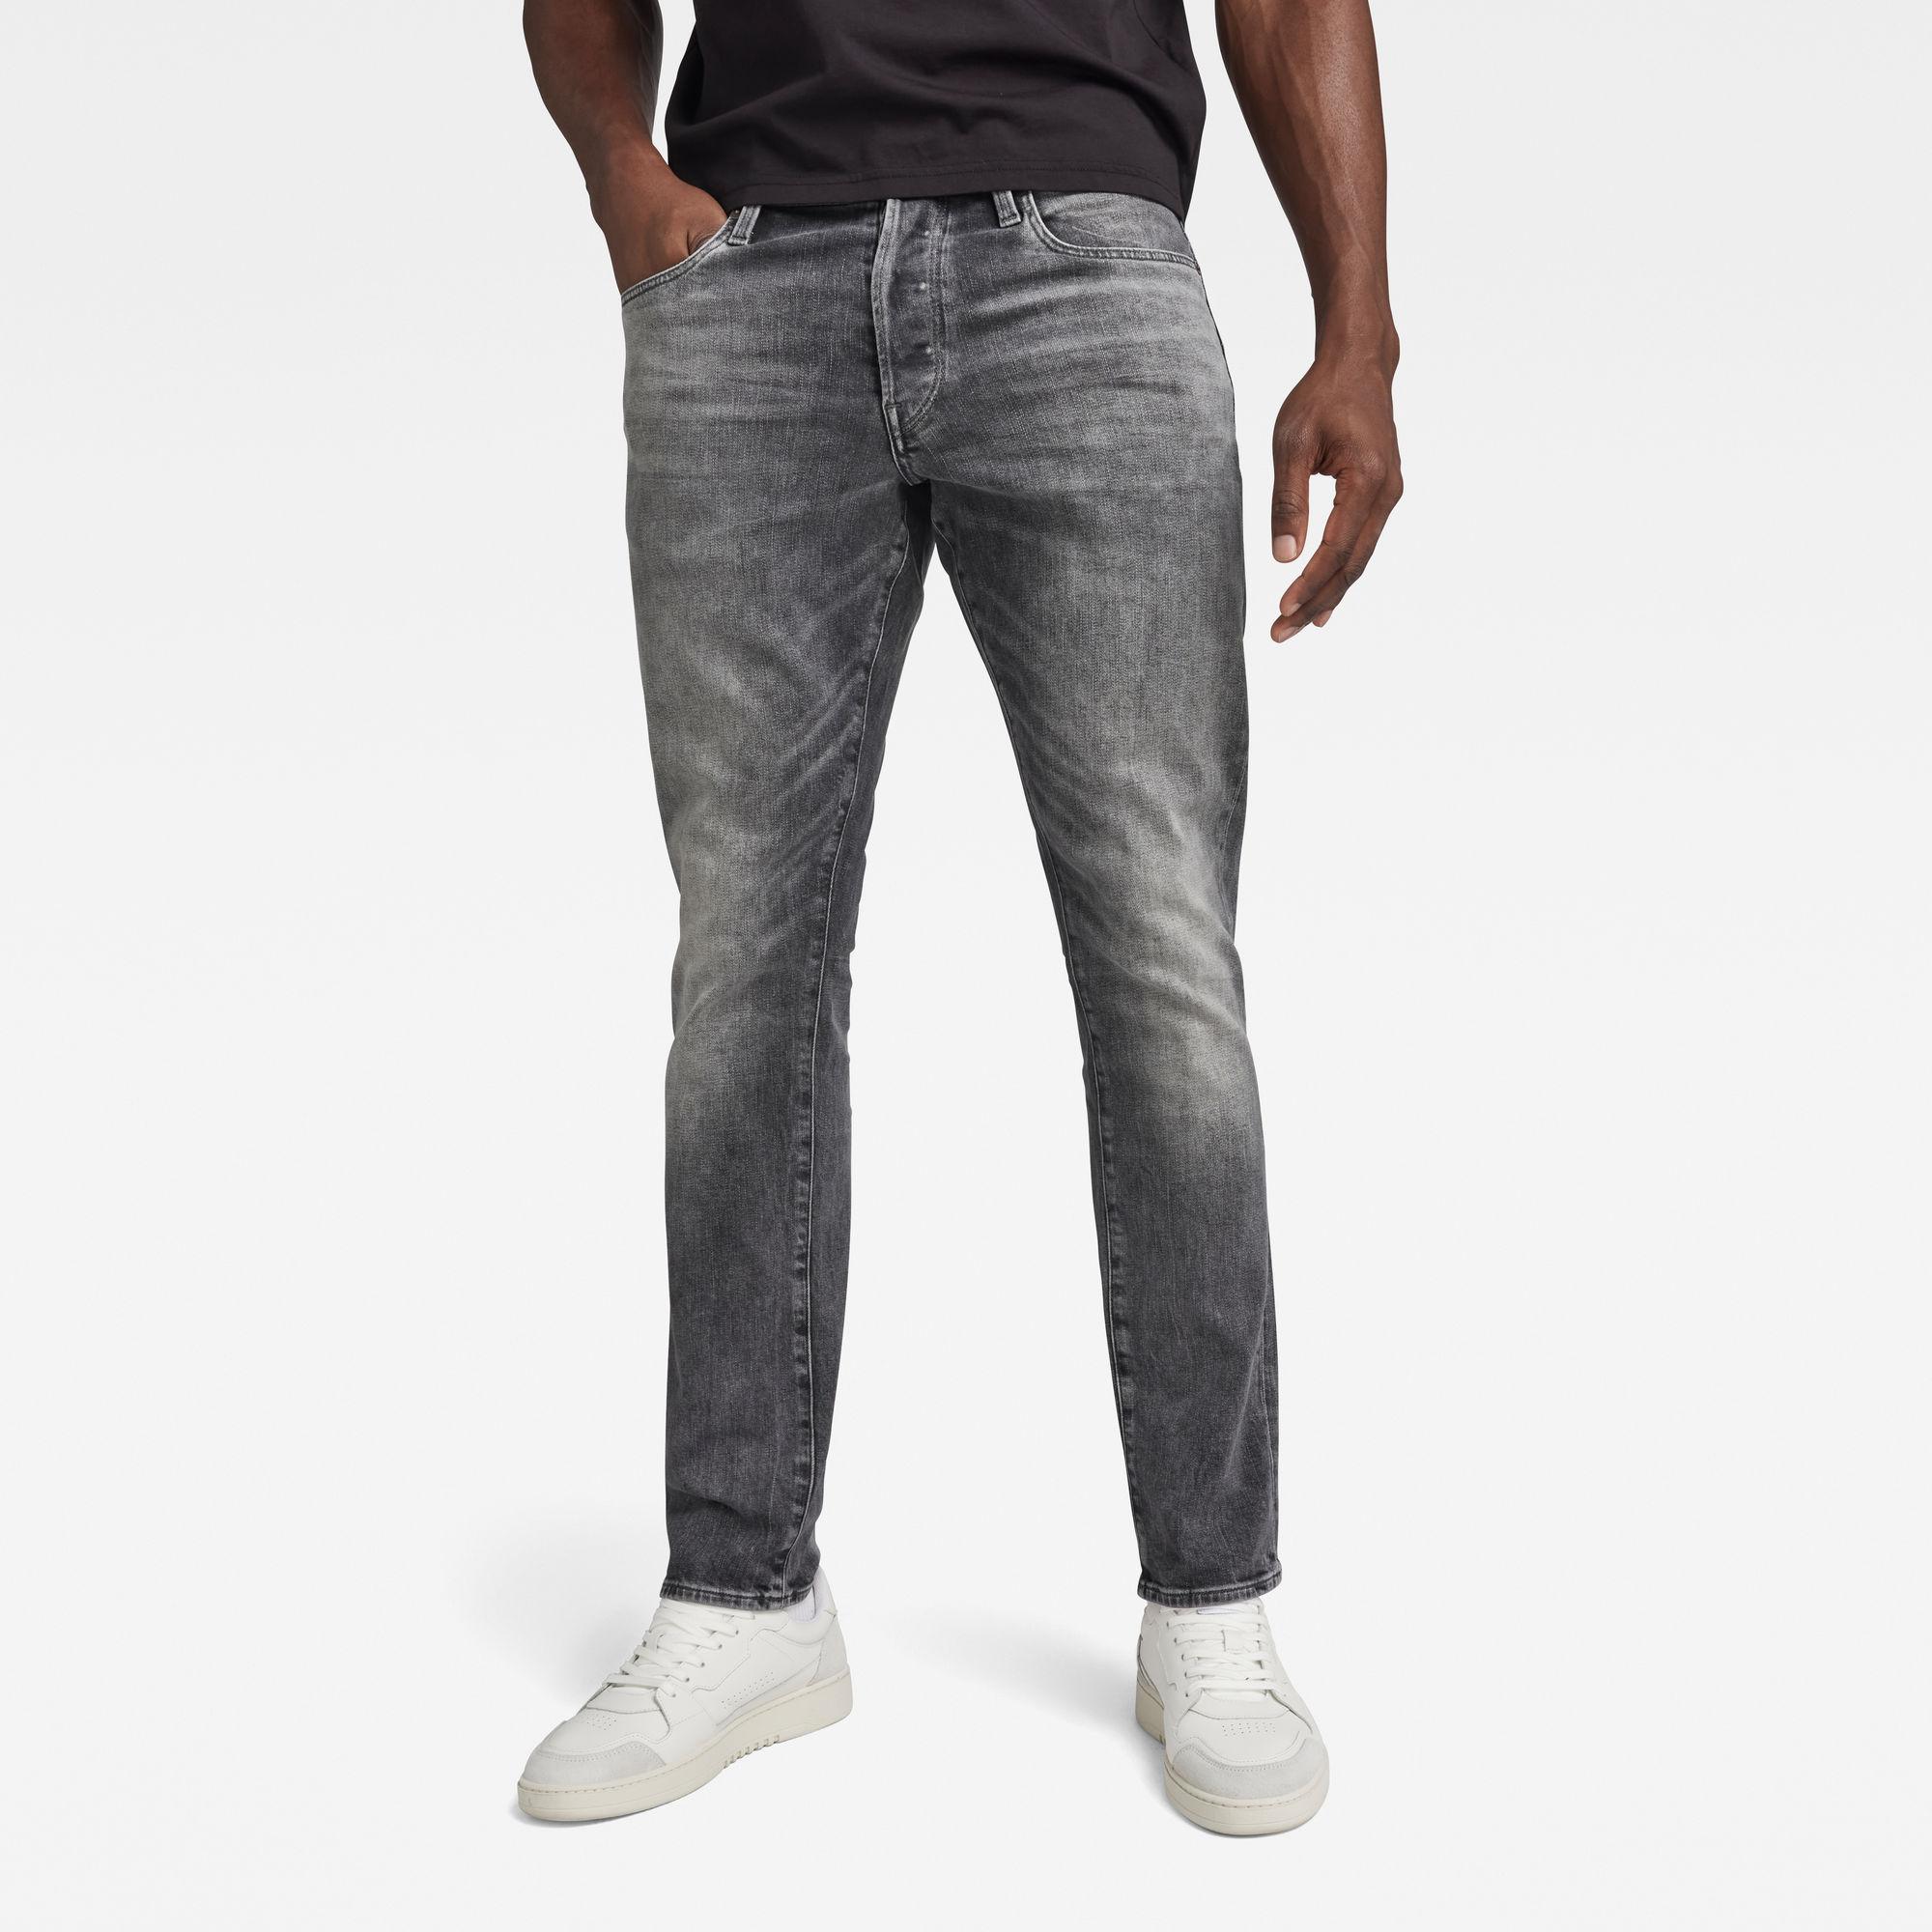 G-Star RAW Heren 3301 Straight Tapered Jeans Grijs